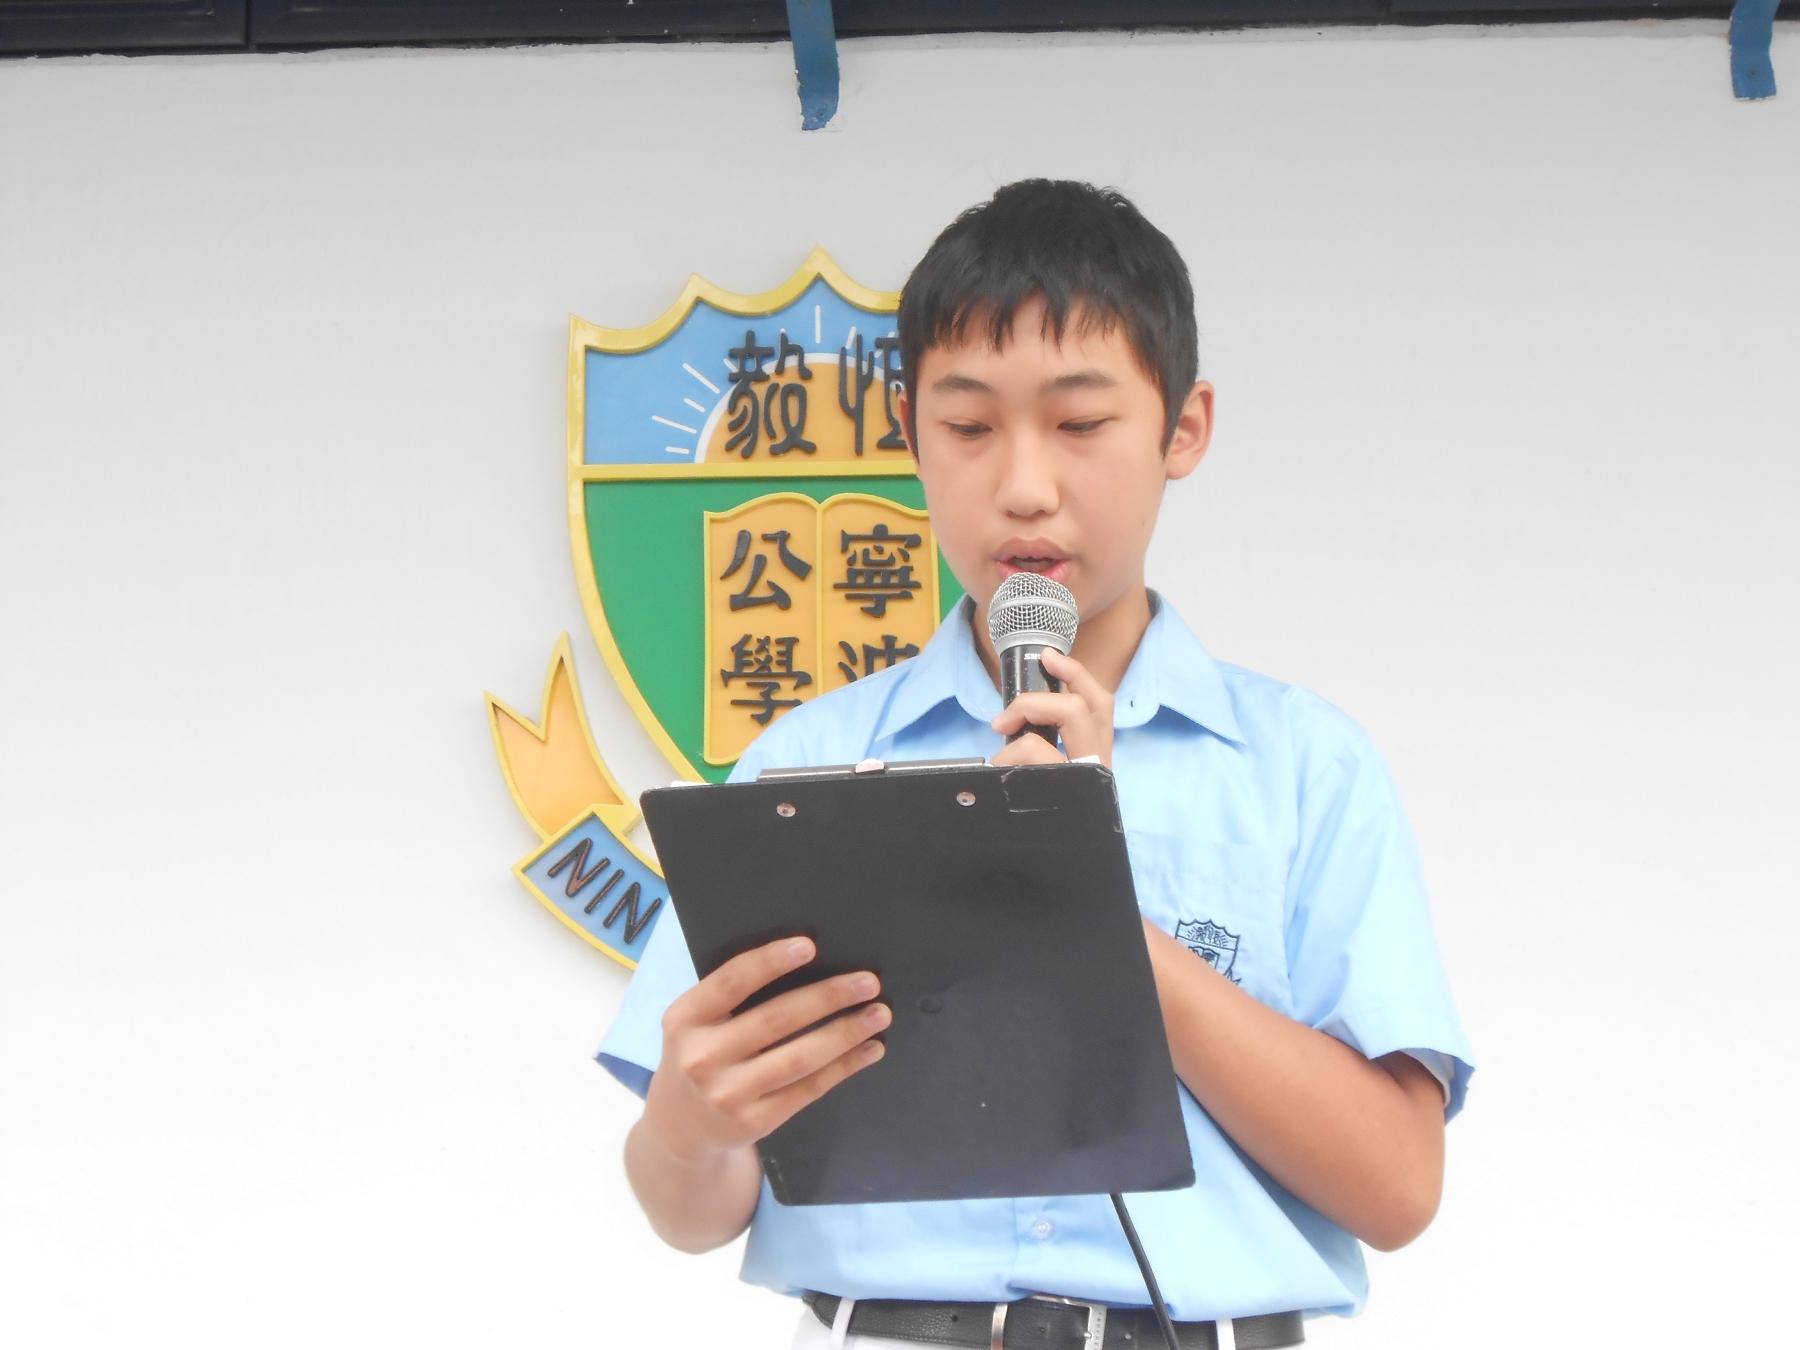 http://npc.edu.hk/sites/default/files/dscn8988_1.jpg